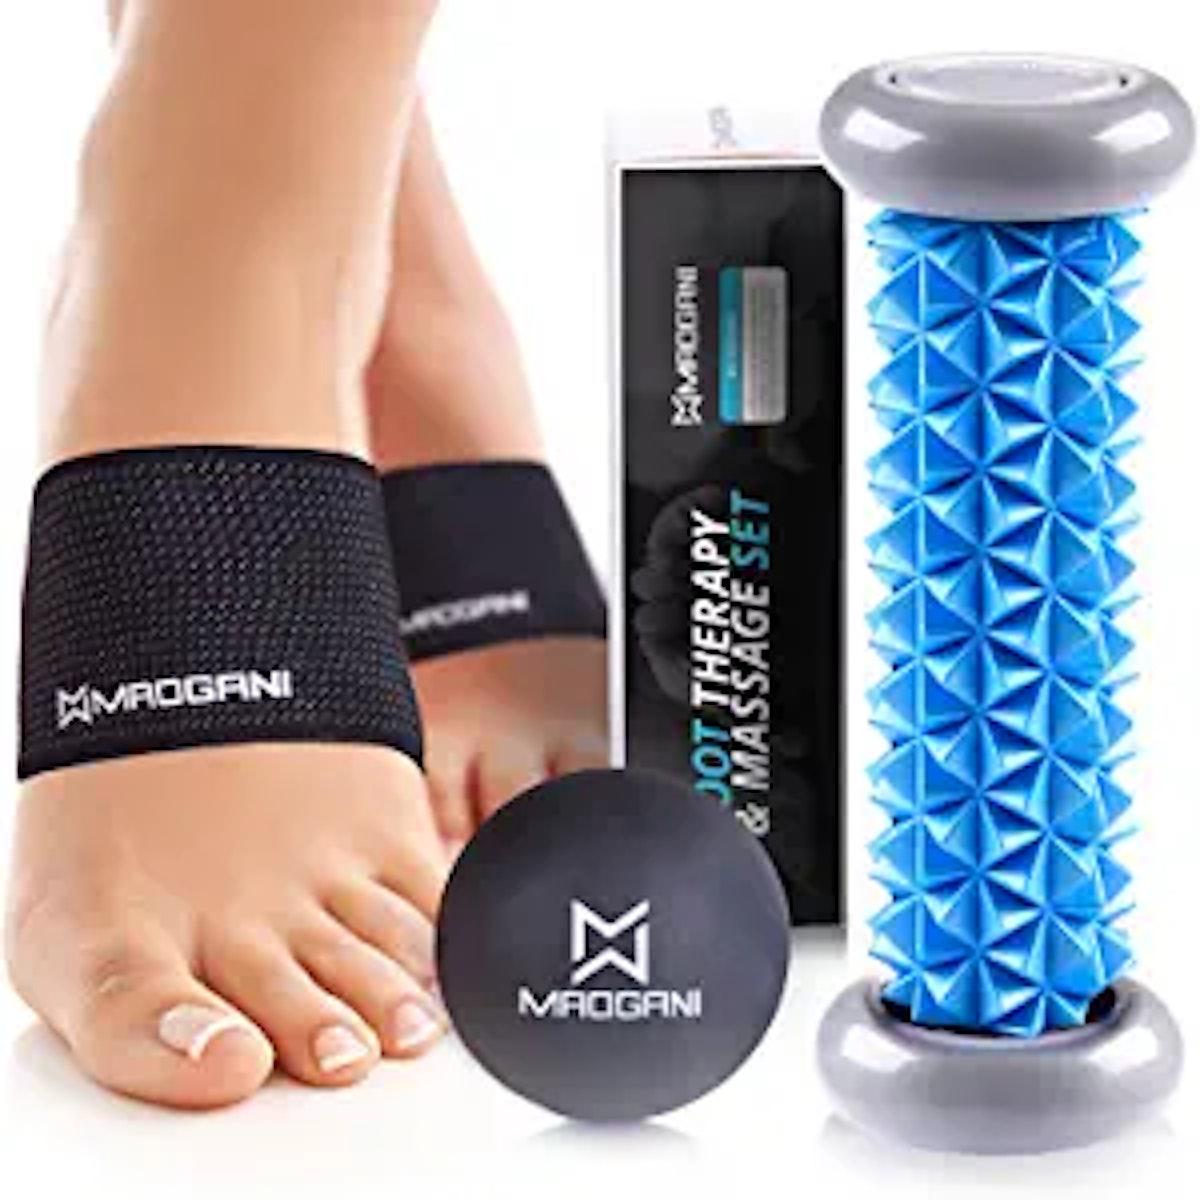 Maogani Foot Massager Roller Ball & Arch Support